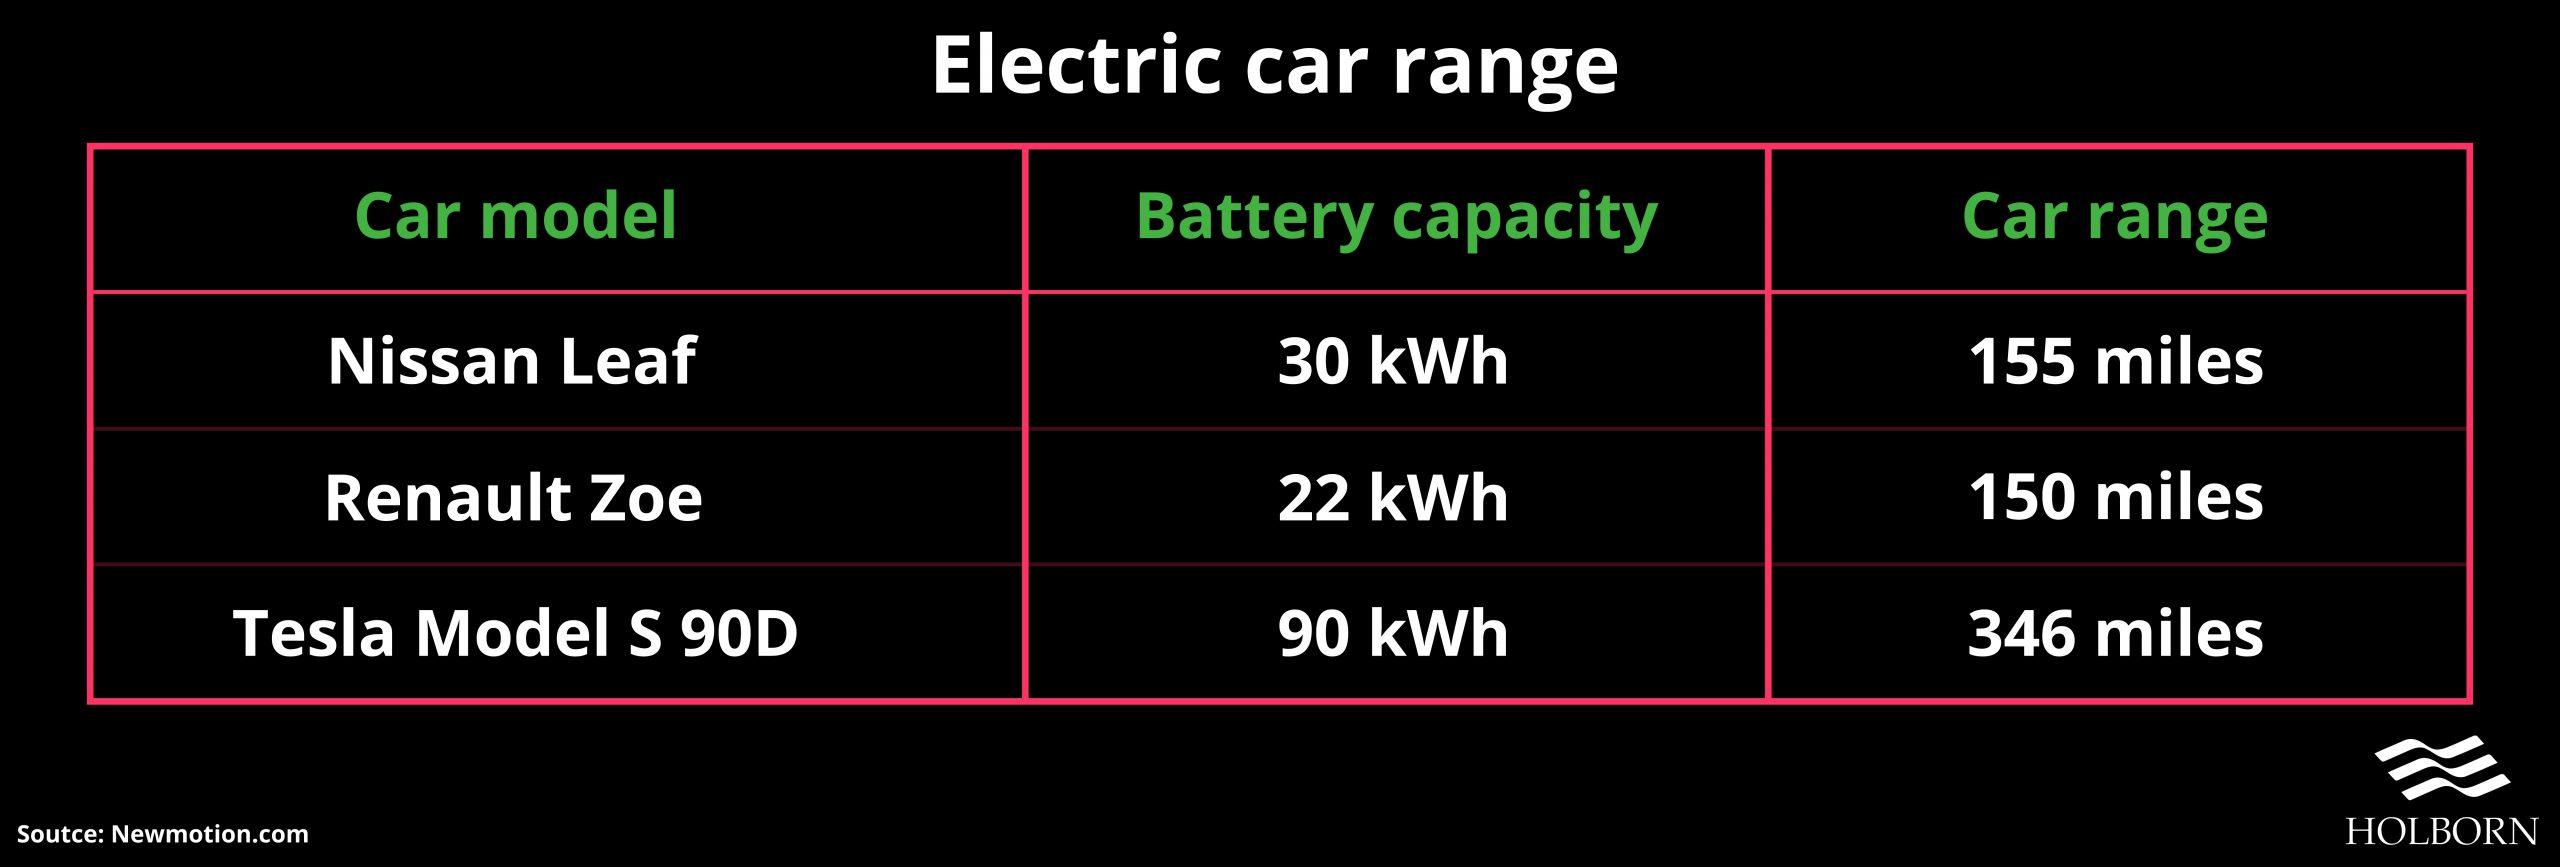 Green Electric car range